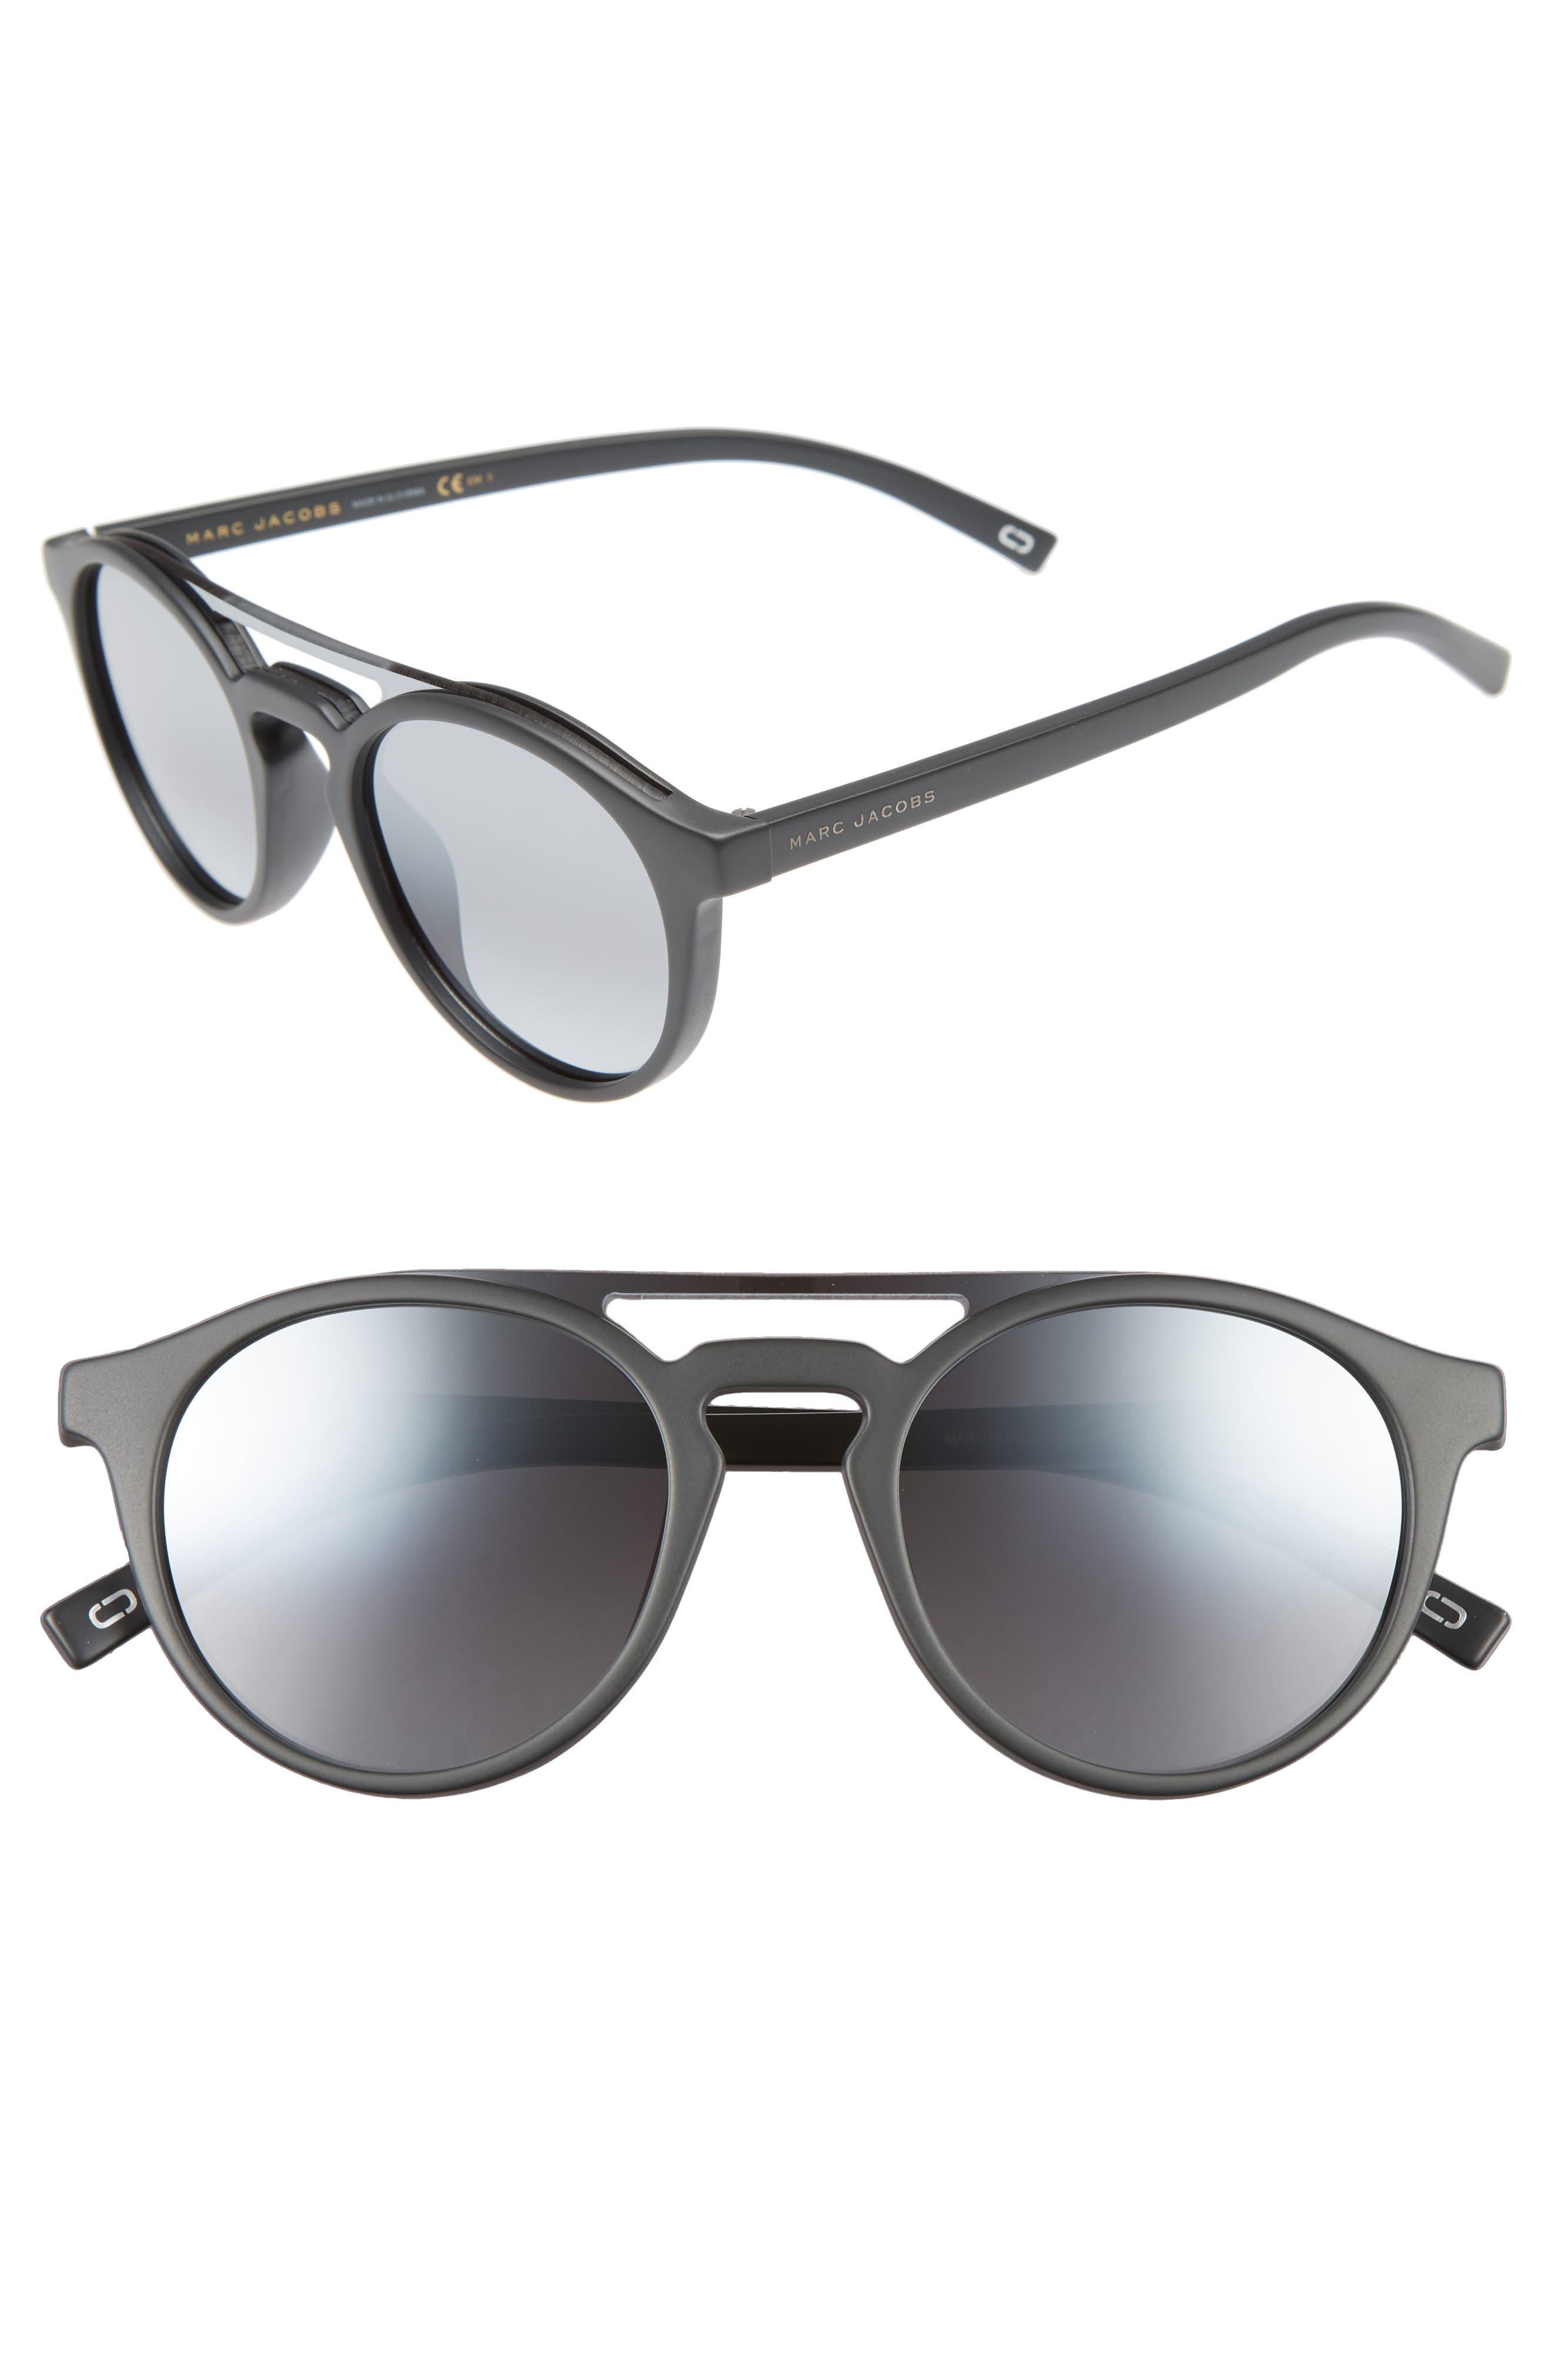 99mm Round Brow Bar Sunglasses,                             Main thumbnail 1, color,                             021